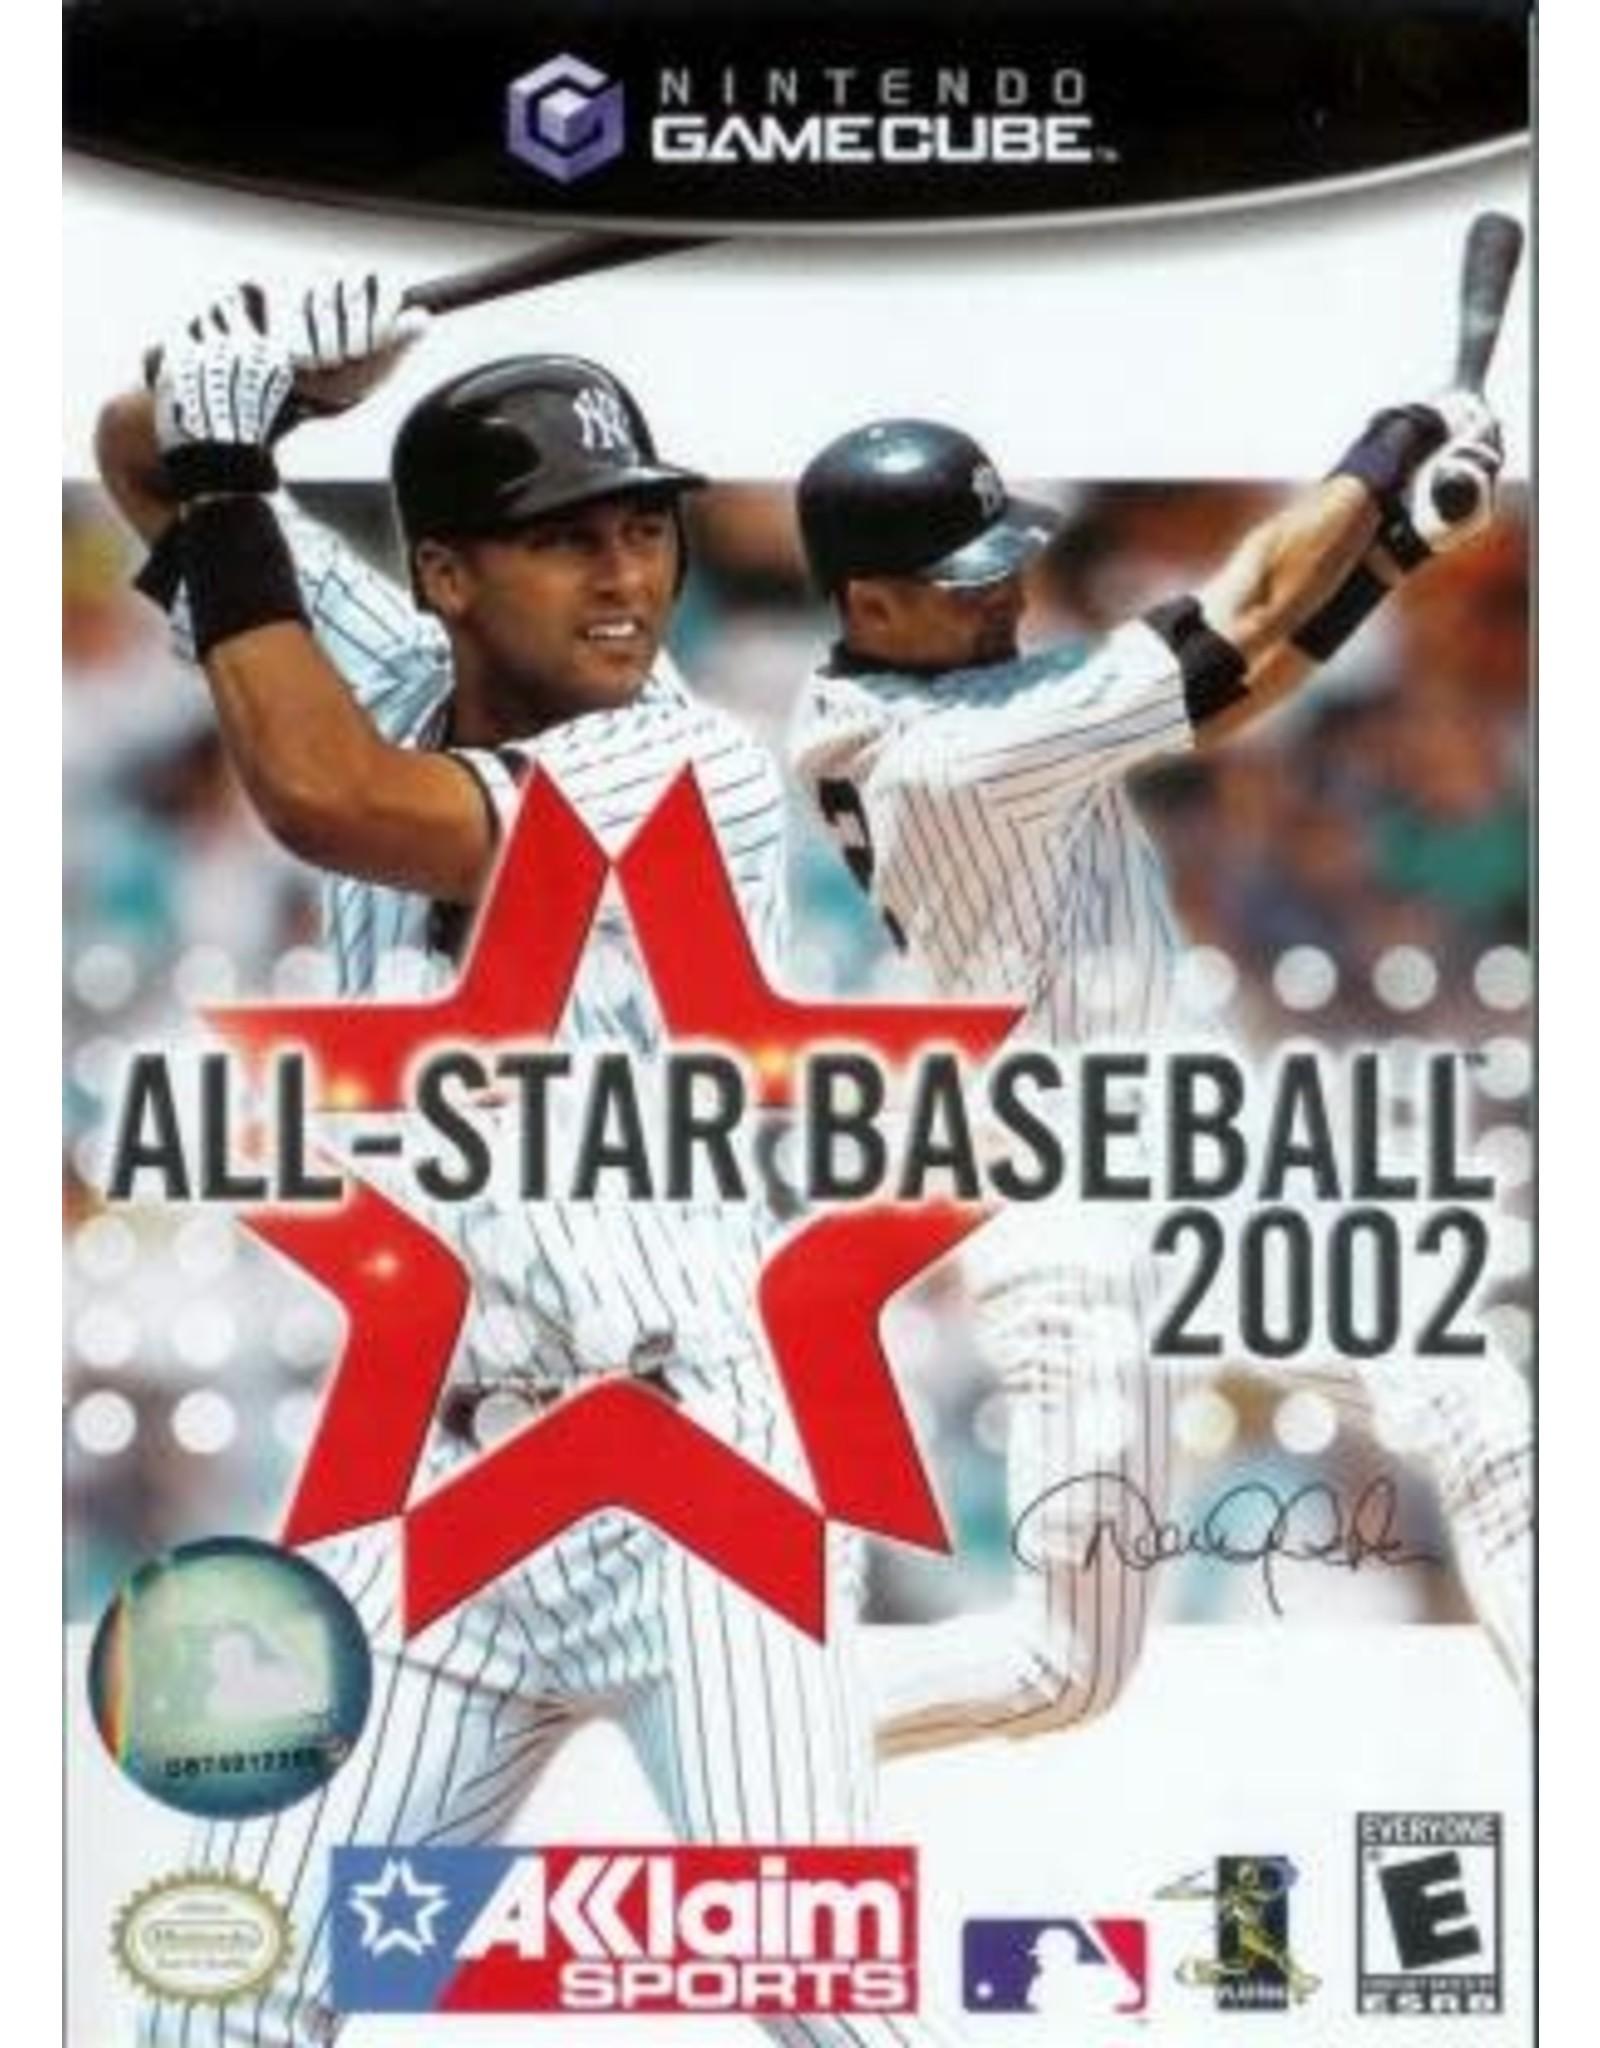 Gamecube All-Star Baseball 2002 (CiB)